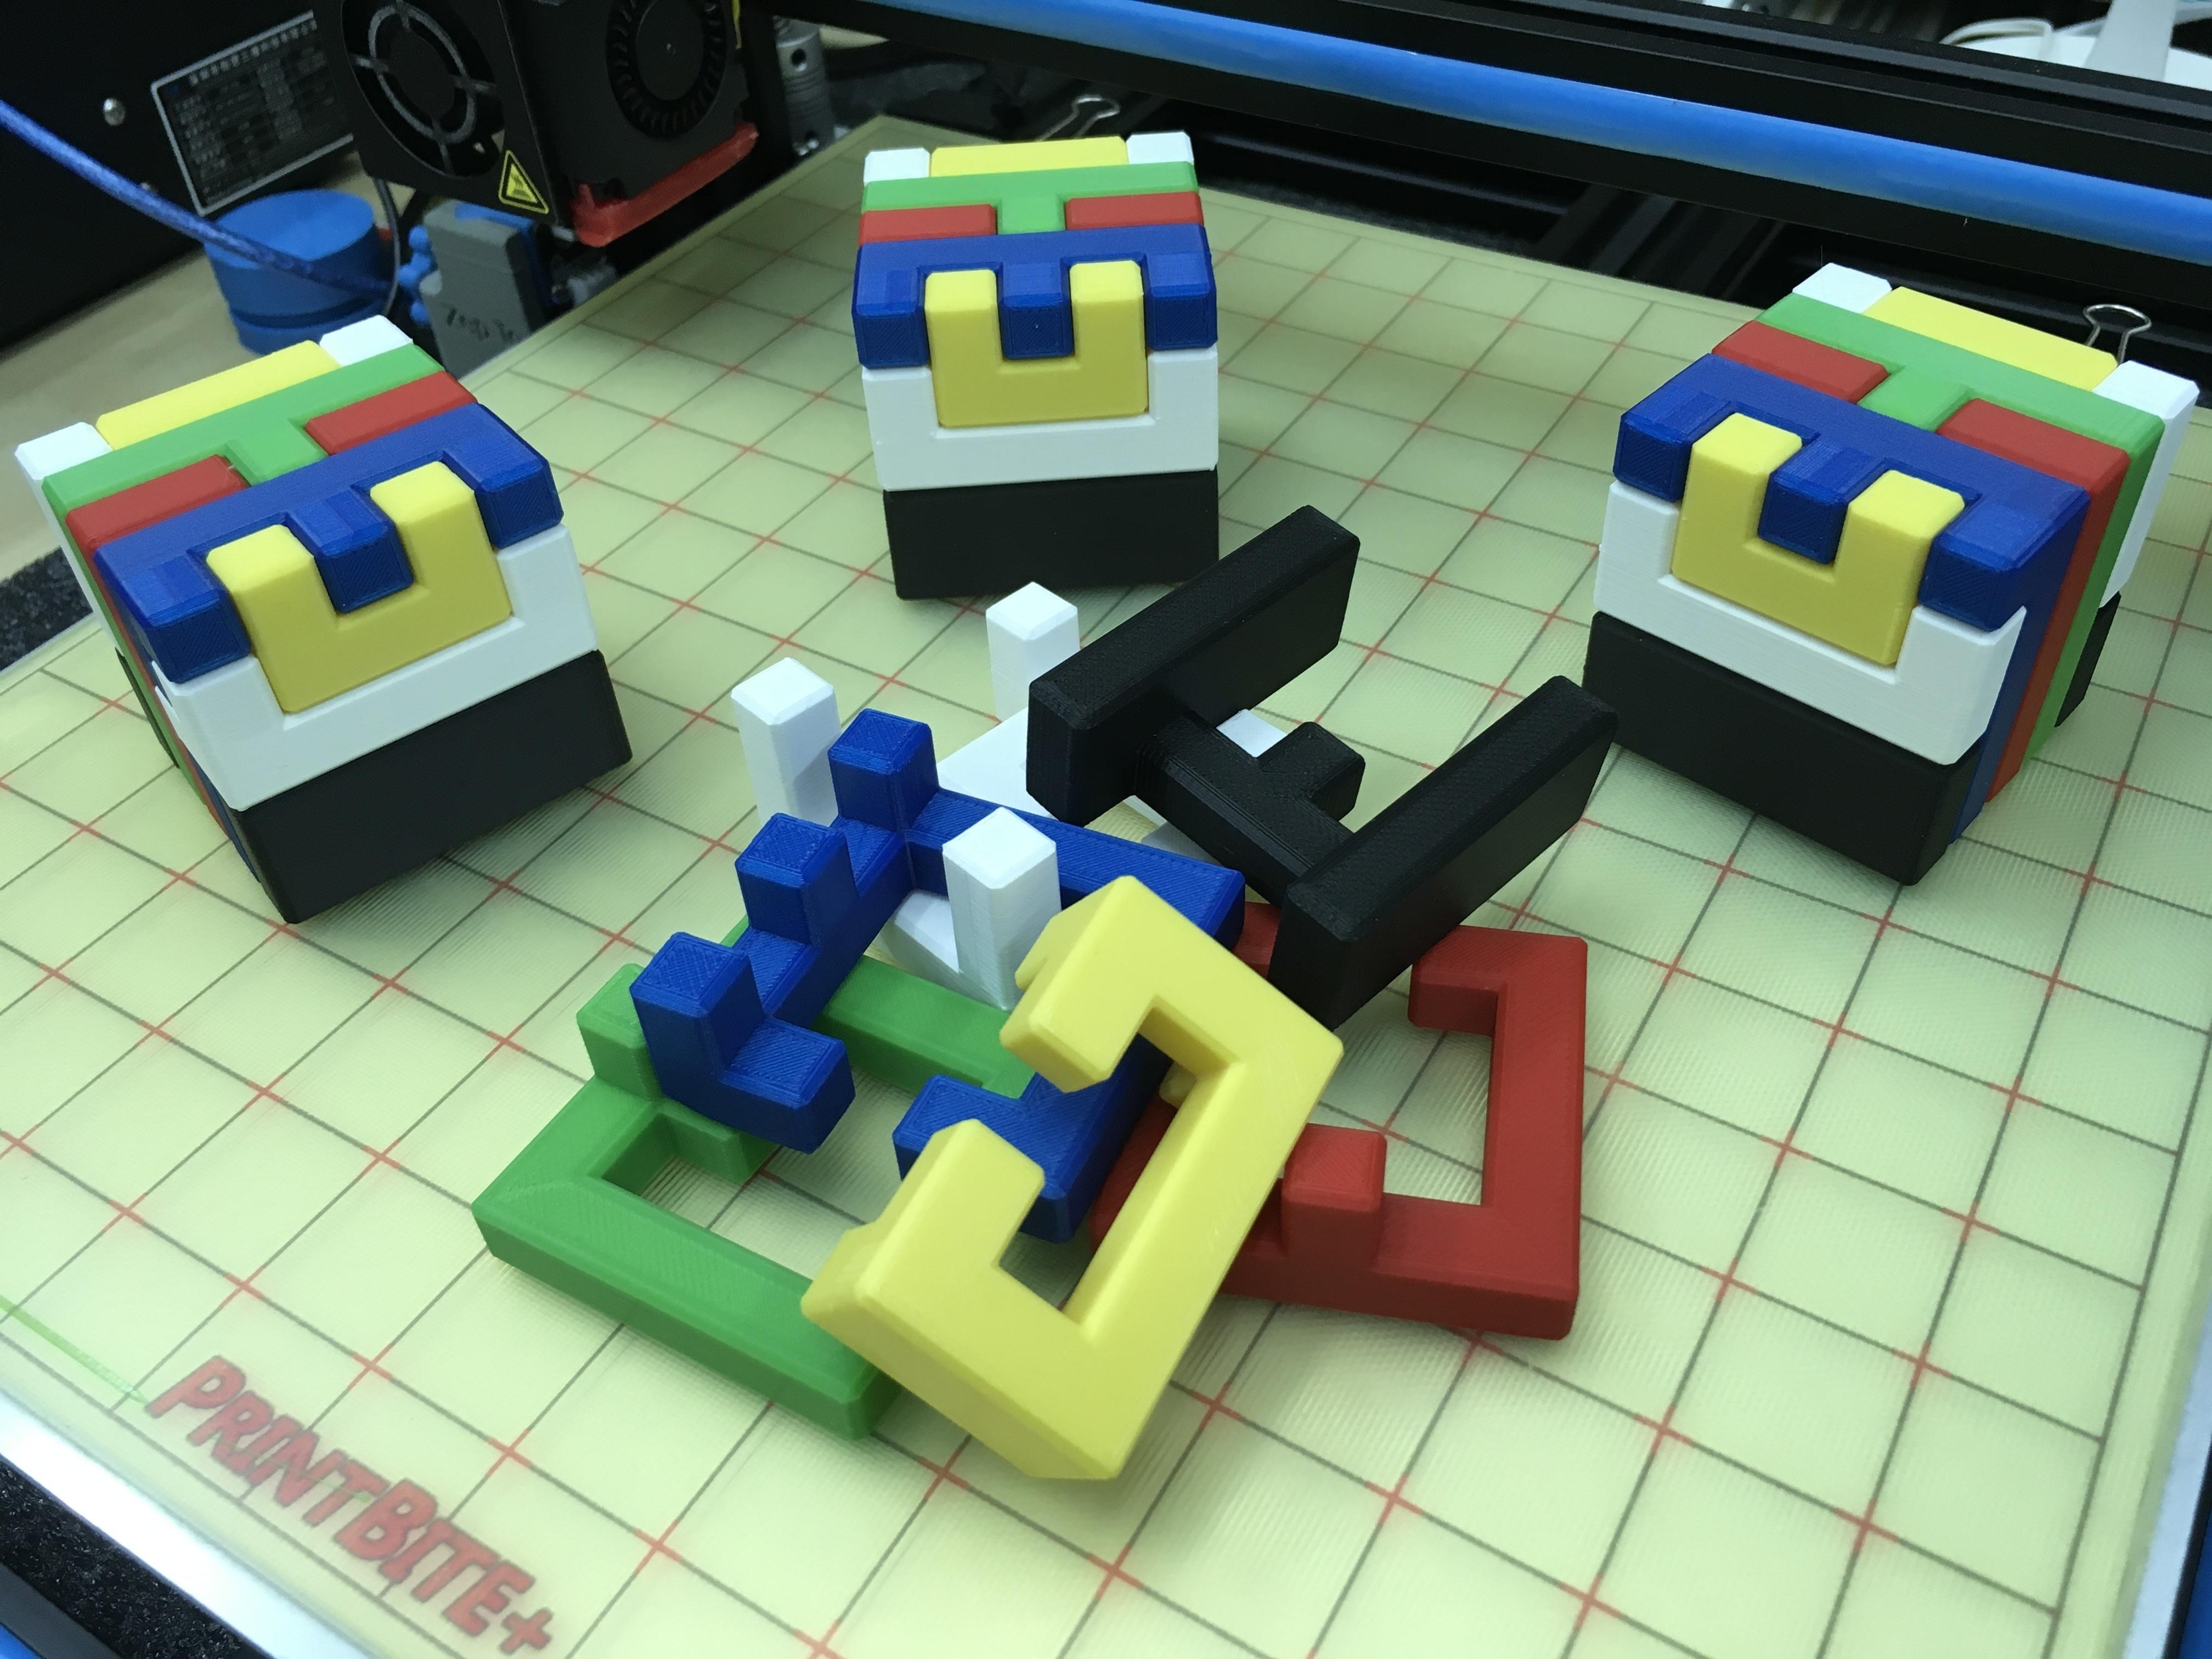 3D Printed Printable Interlocking Puzzle #4 - Level 11Richgain - Printable 3D Puzzle